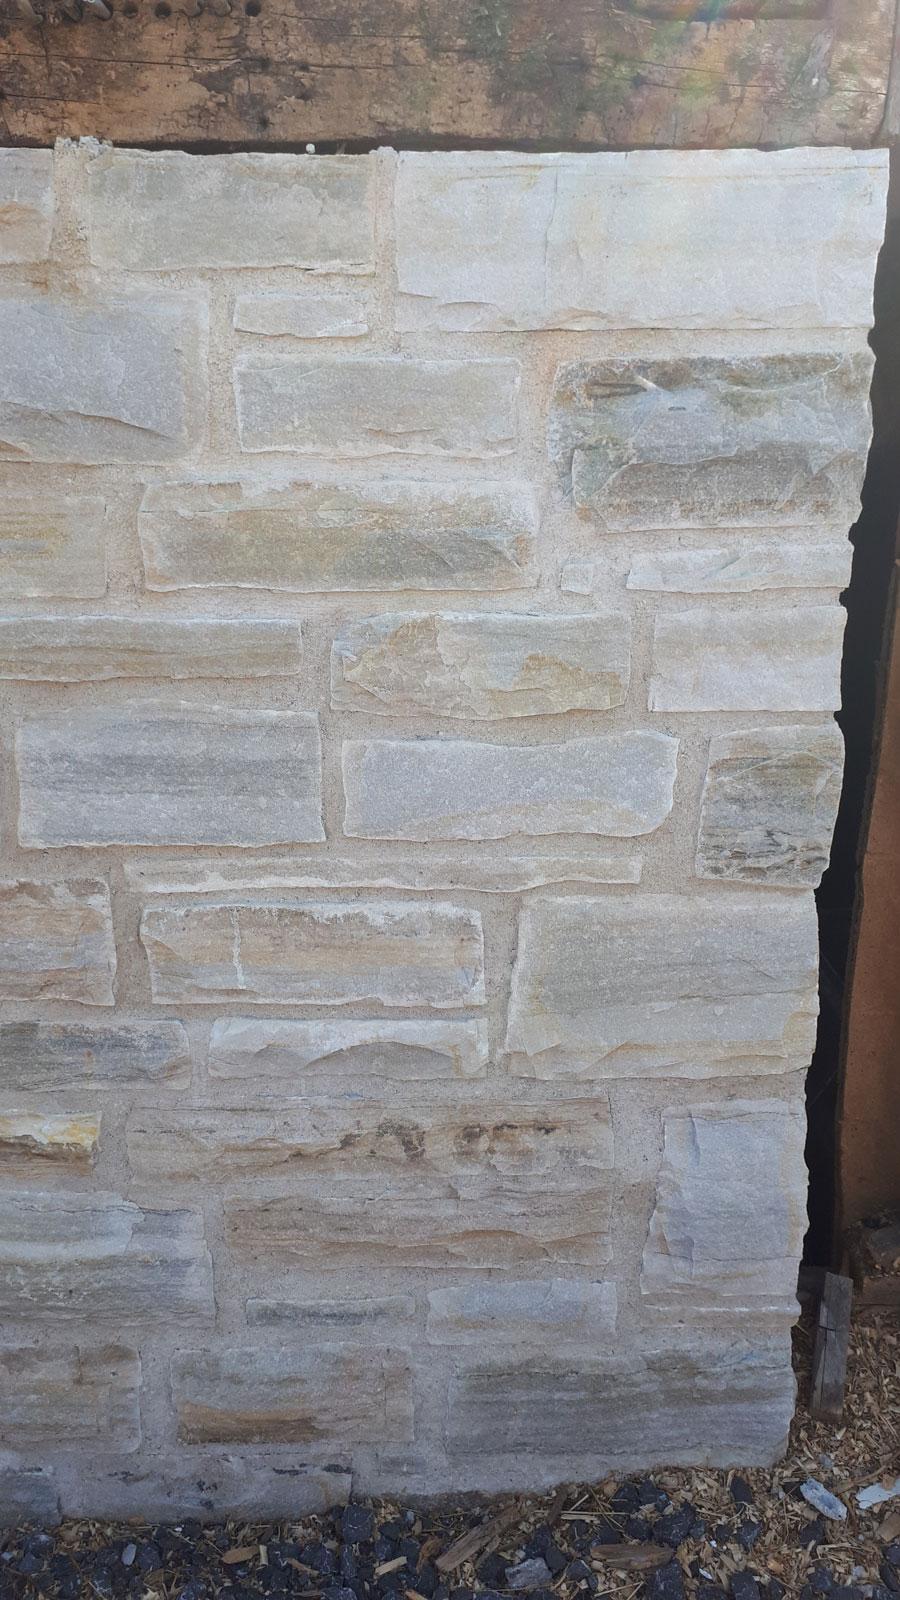 Bradley-Craig barn foundation restoration, April 2021